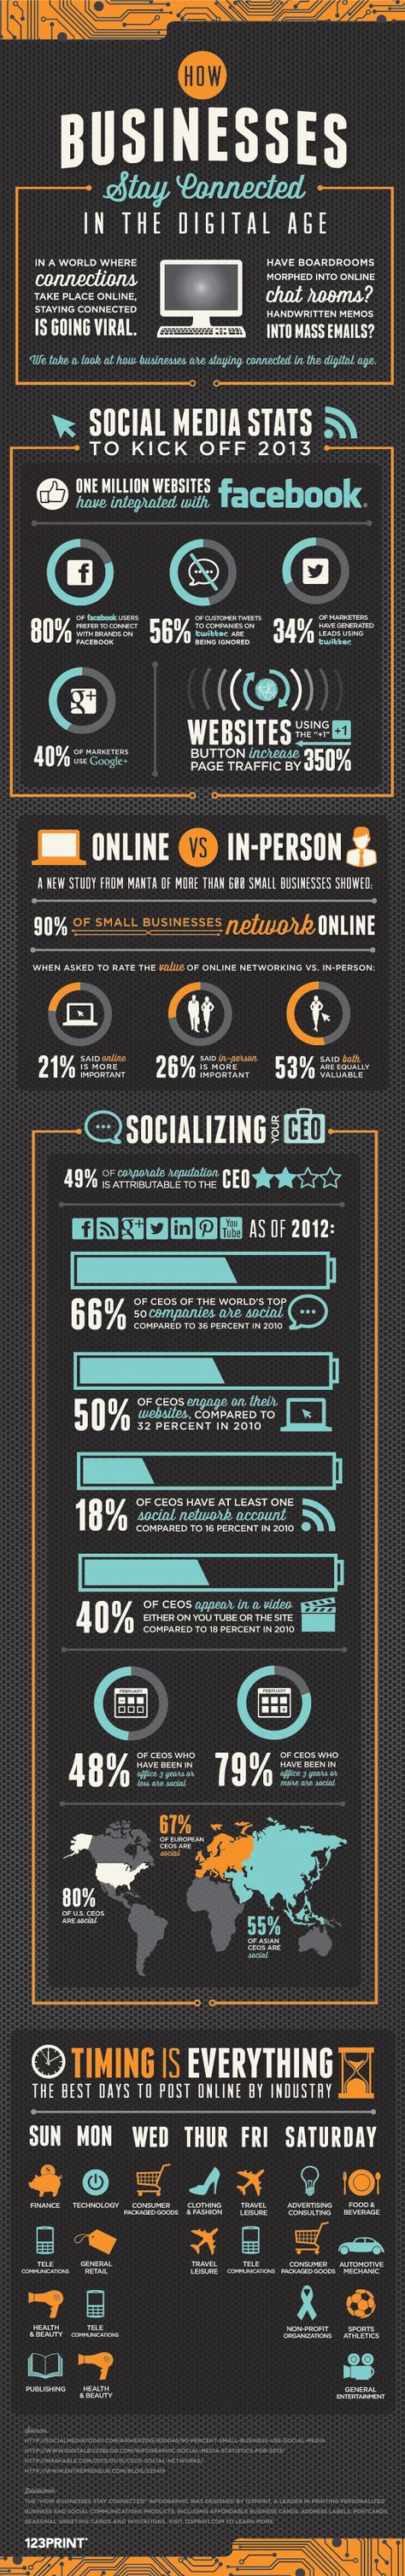 Digital Marketing Agency in India | Social Media Agency | SocialChamps